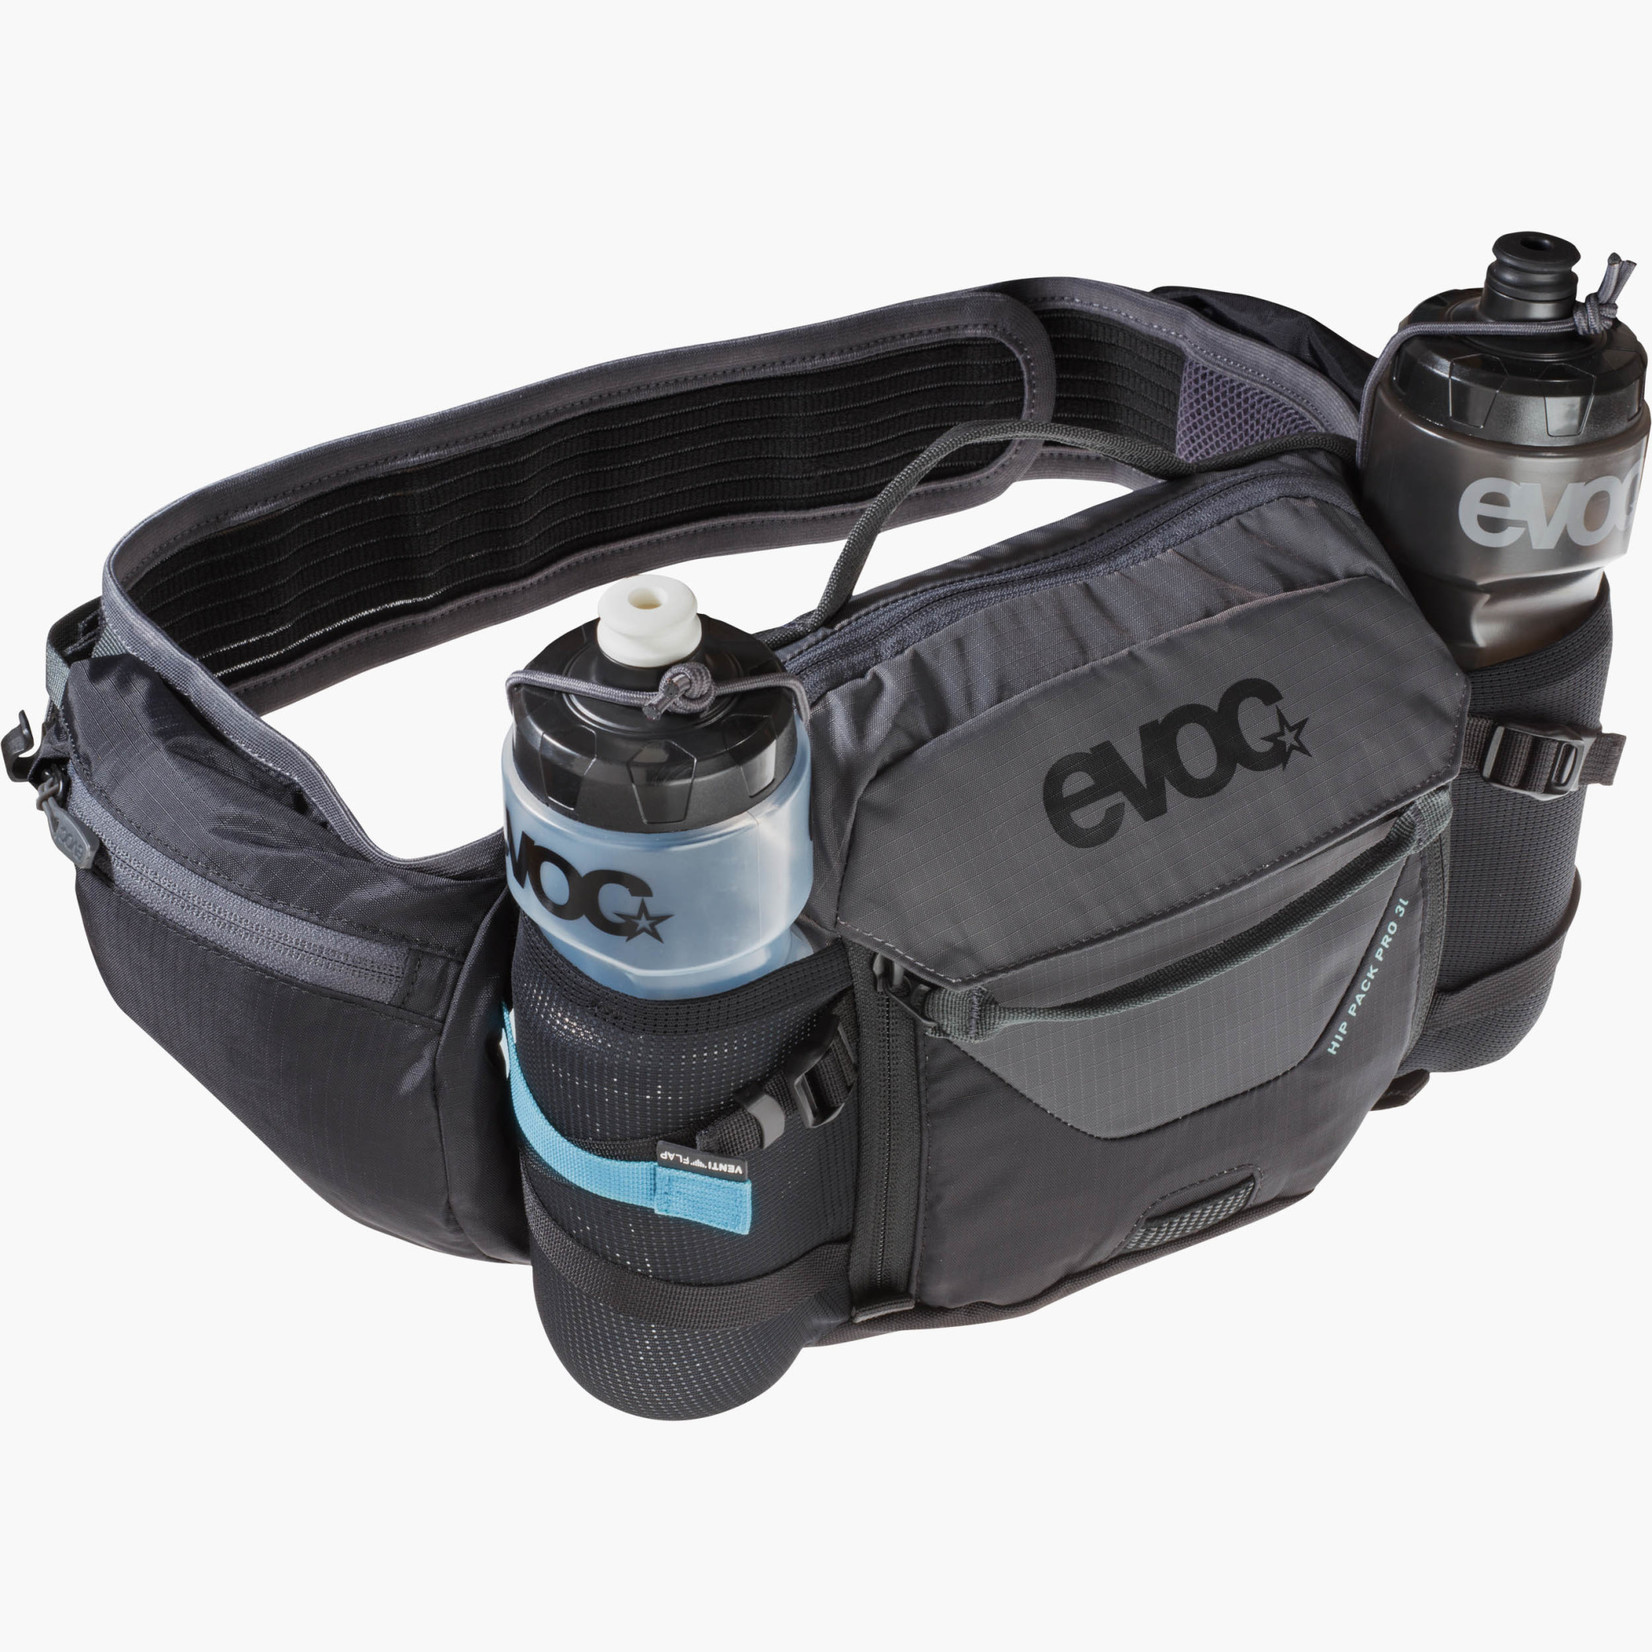 EVOC EVOC Hip Pack Pro 3L